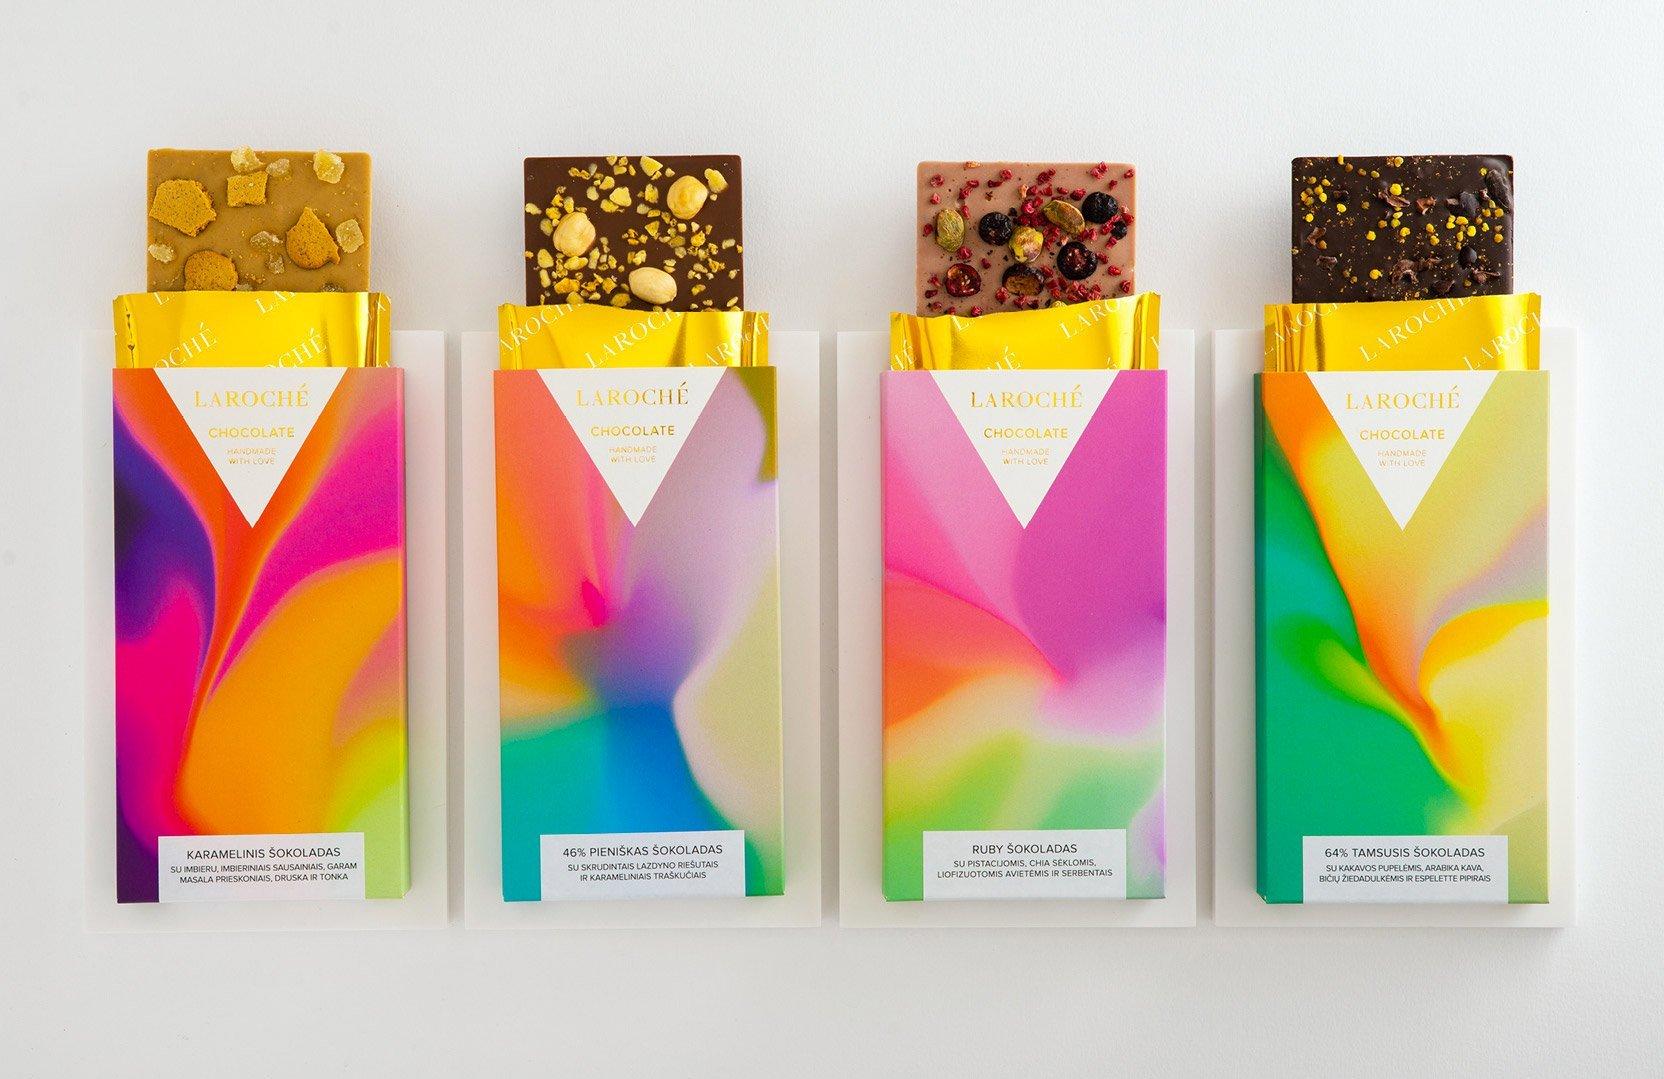 Laroche-Chocolate-Packaging-by-Martin-Naumann-11